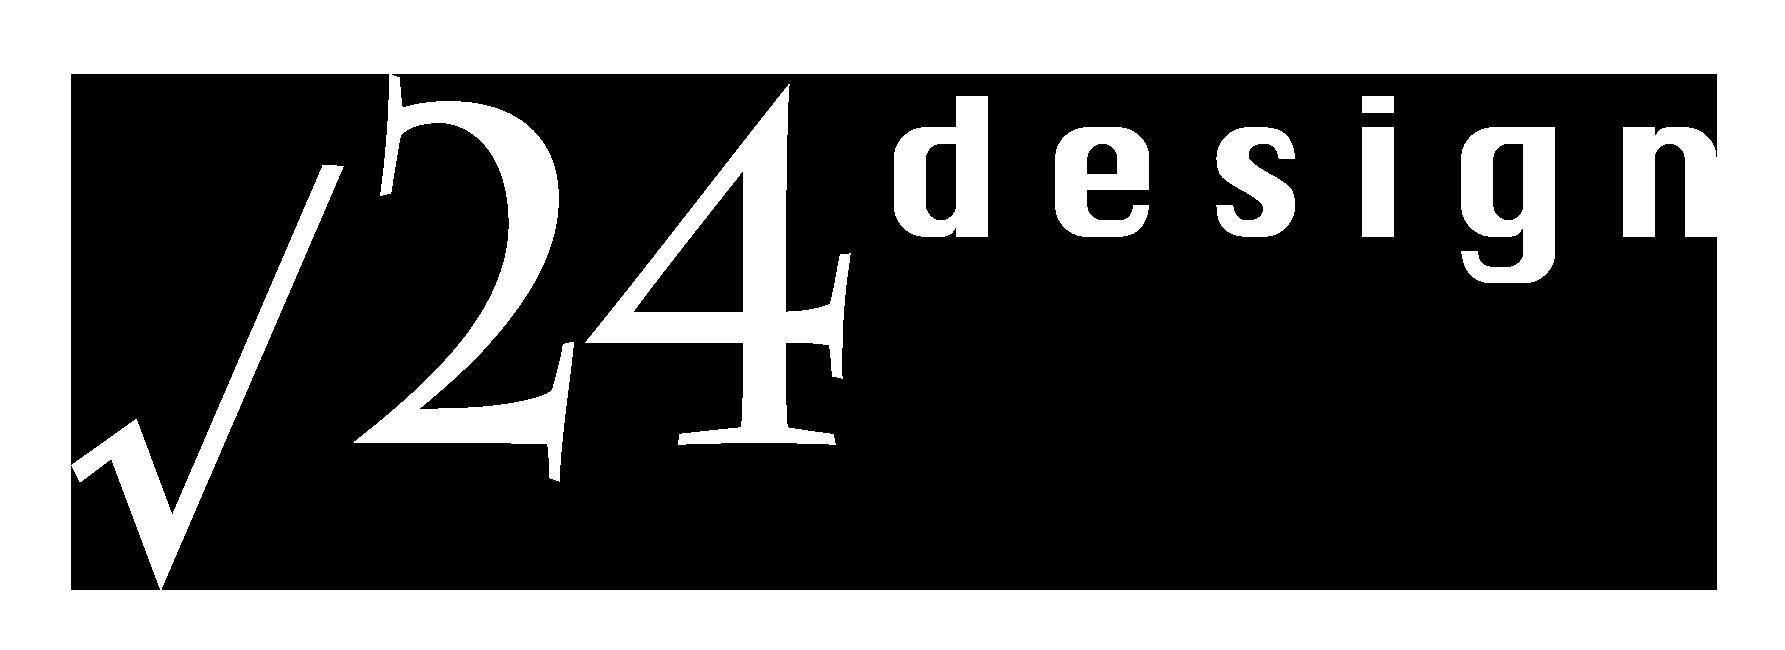 -route24 design-